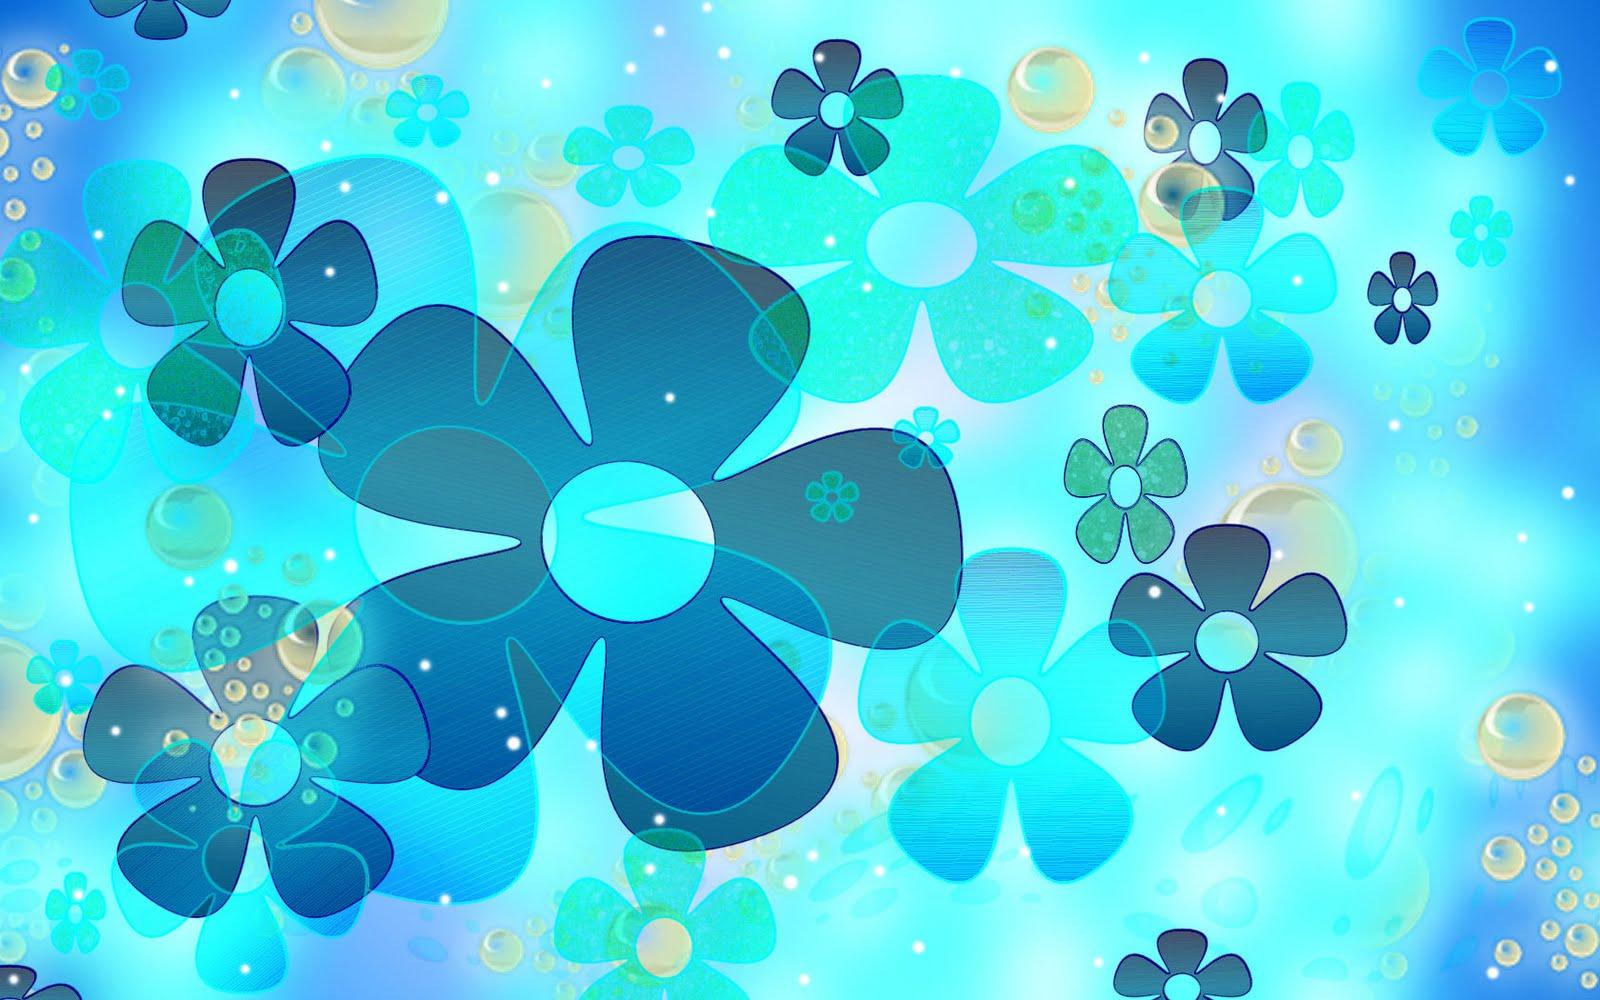 Light Blue Flower Wallpaper WallpaperSafari